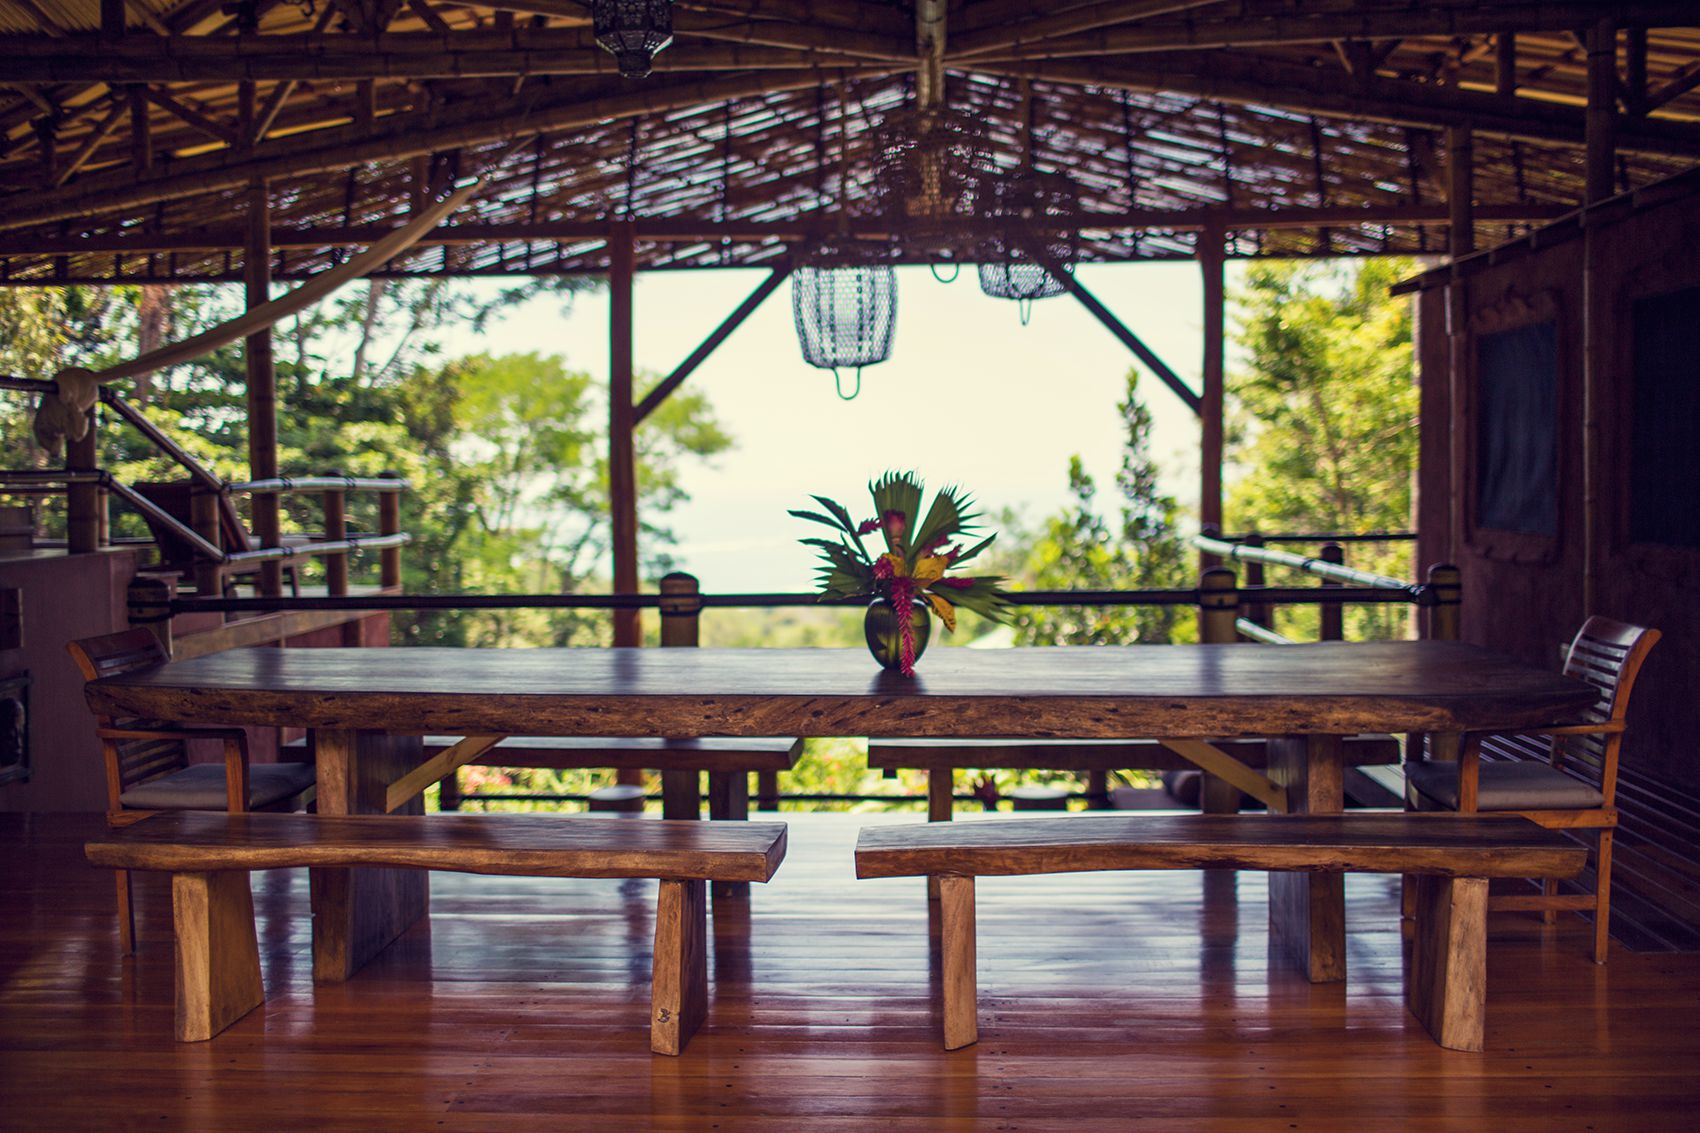 retreat_selva-armonia_yoga-november_2015-diningtable.jpg